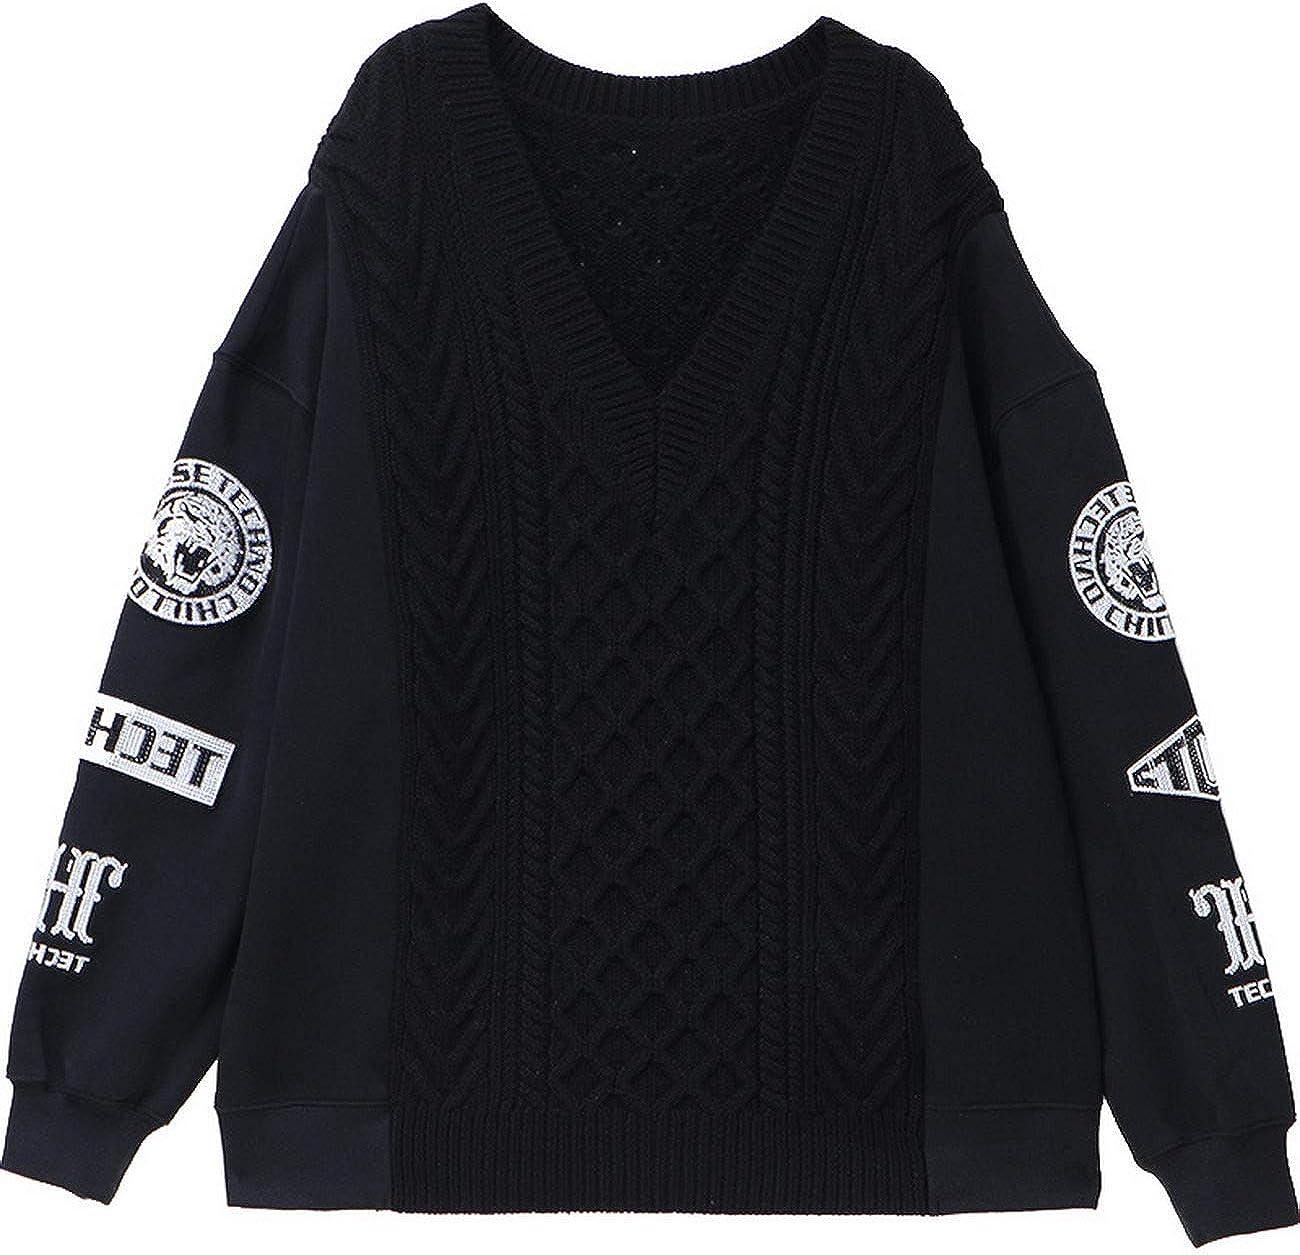 Light Luxury Tide Brand Big C hot Beads Stitching Loose Sweater Men and Women T194116010